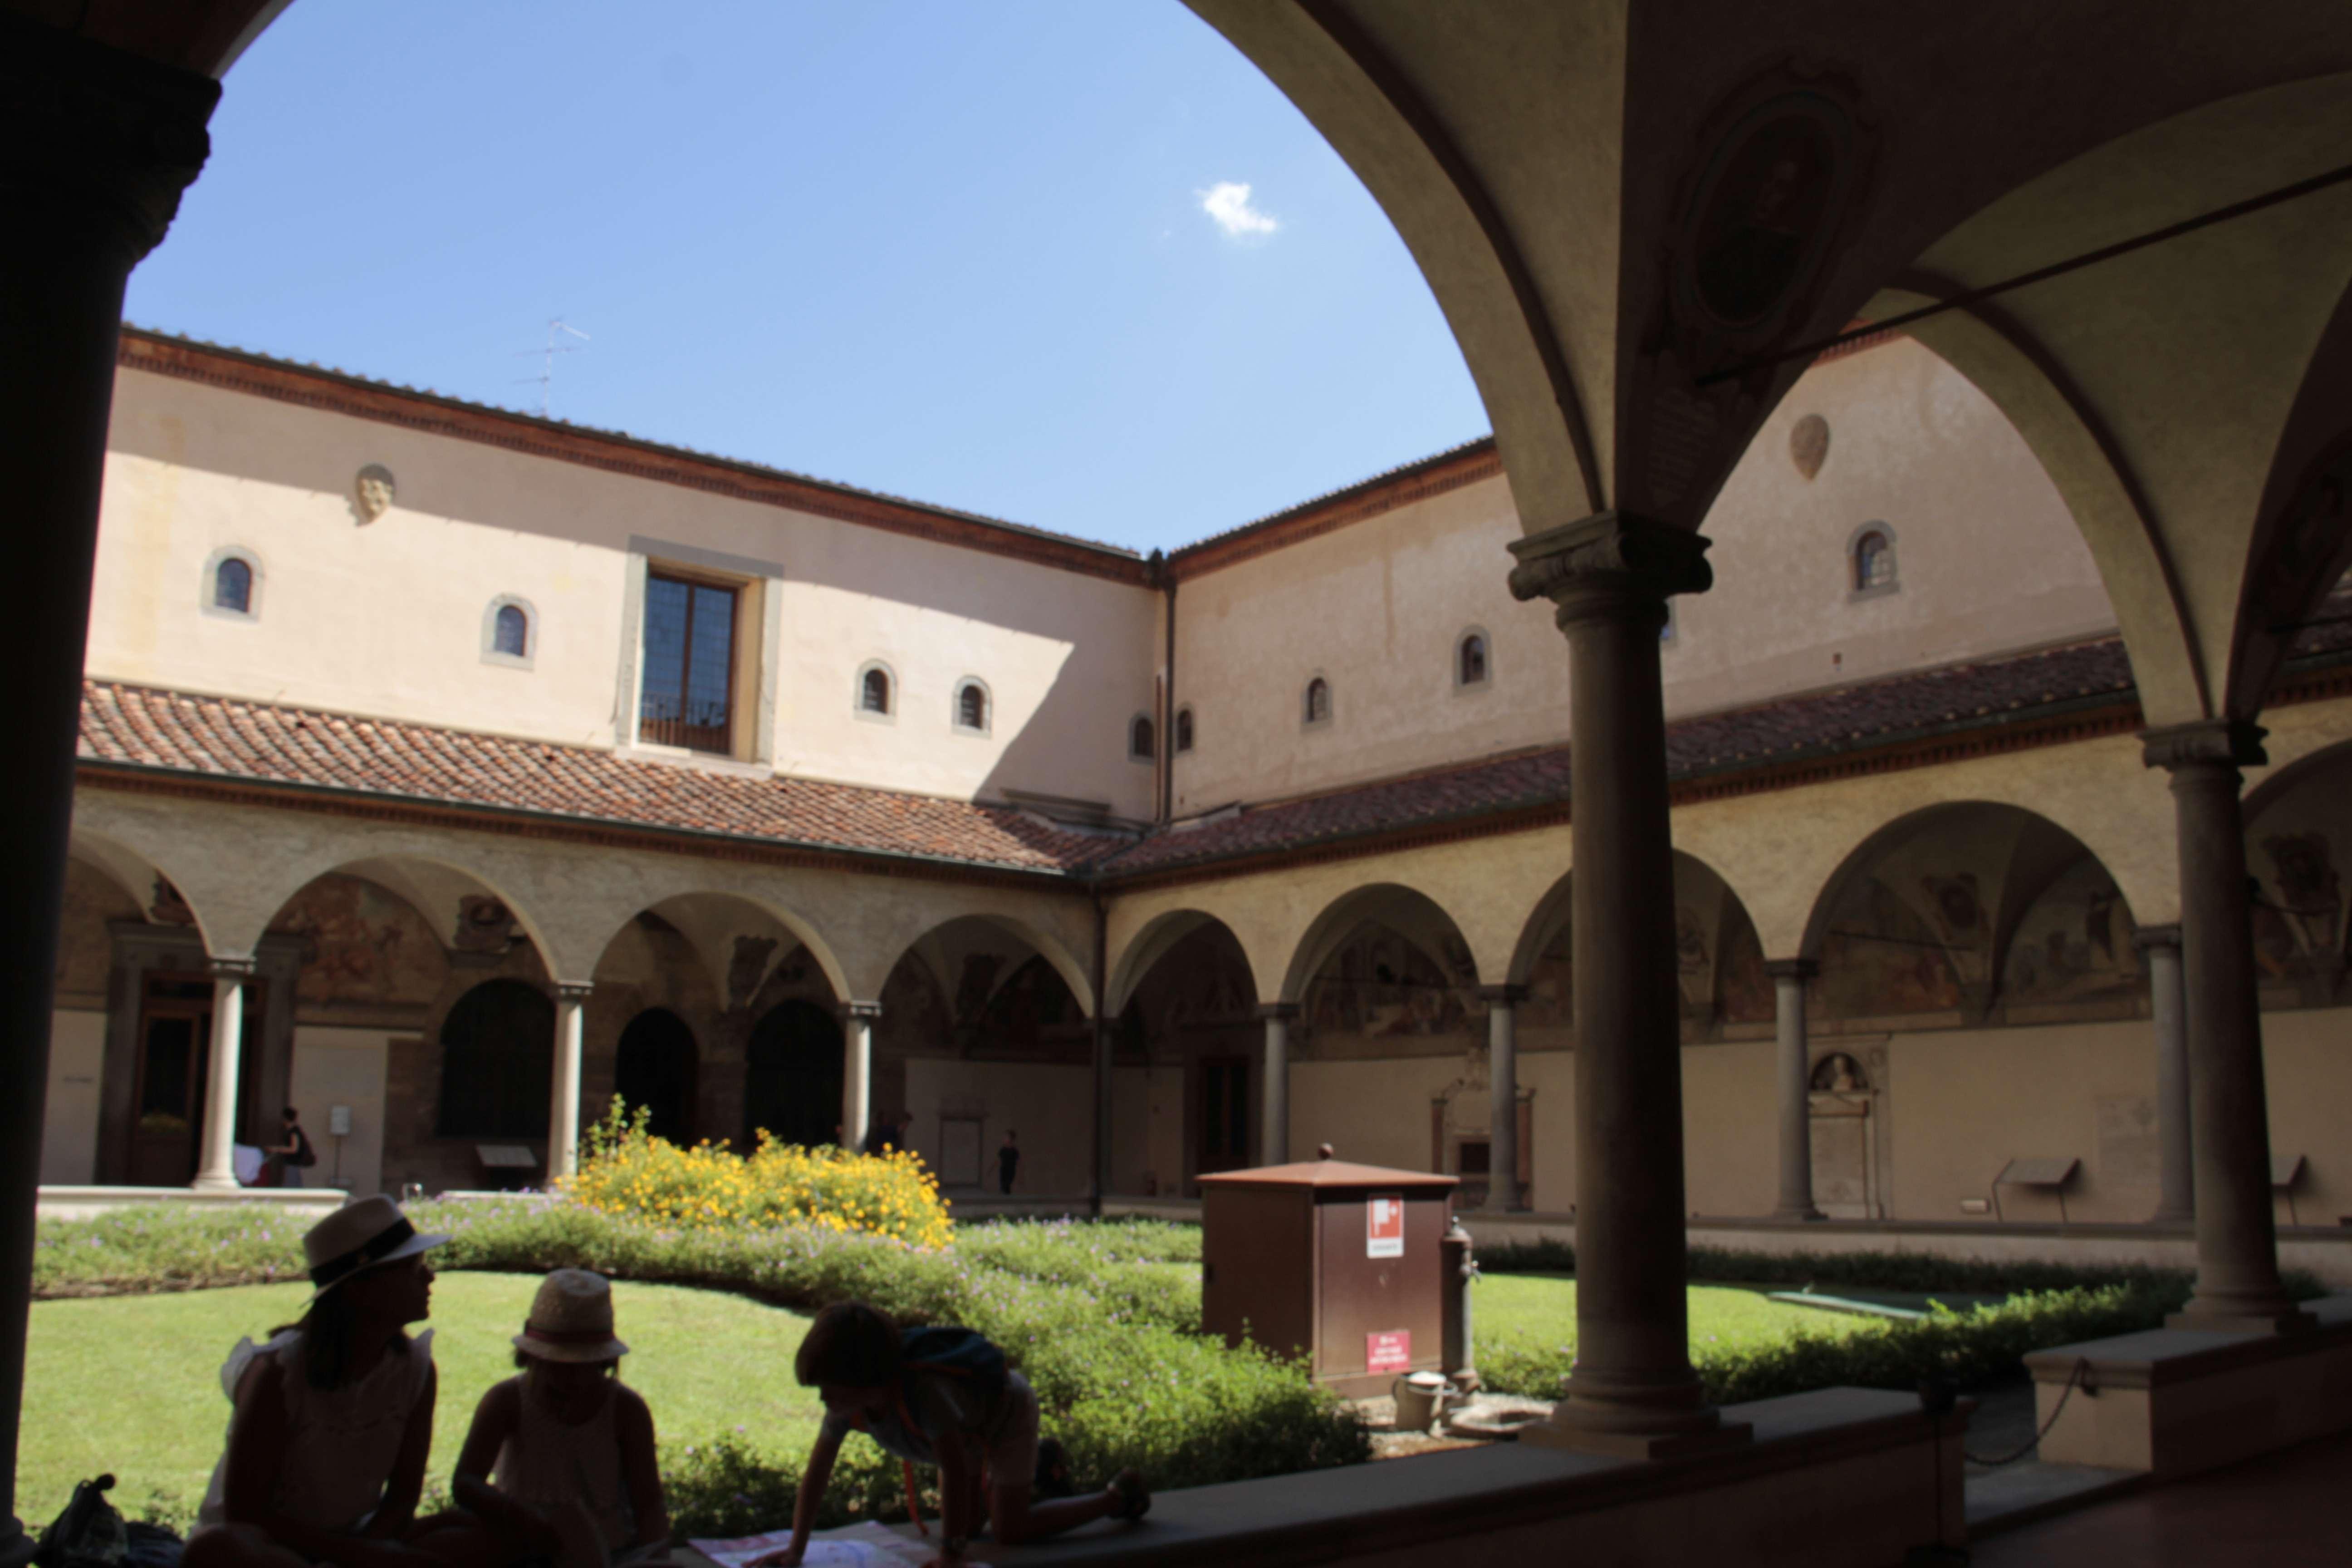 Toscane aout 2016 _0289 Florence San Marco